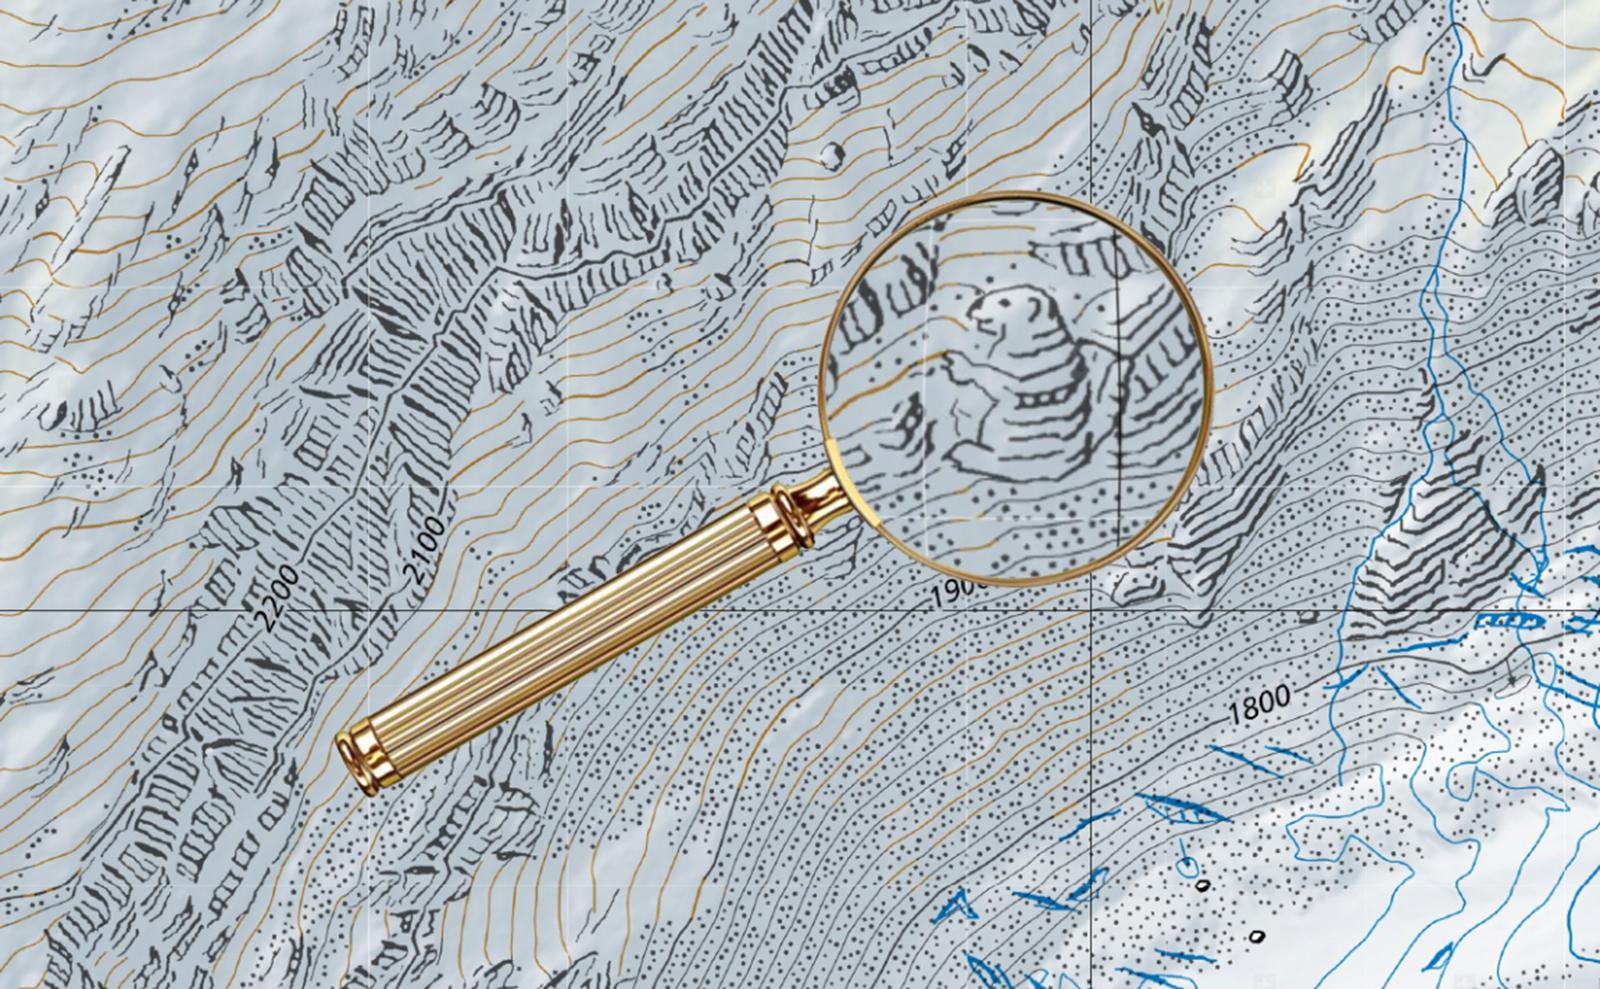 marmot drawing hidden in a map